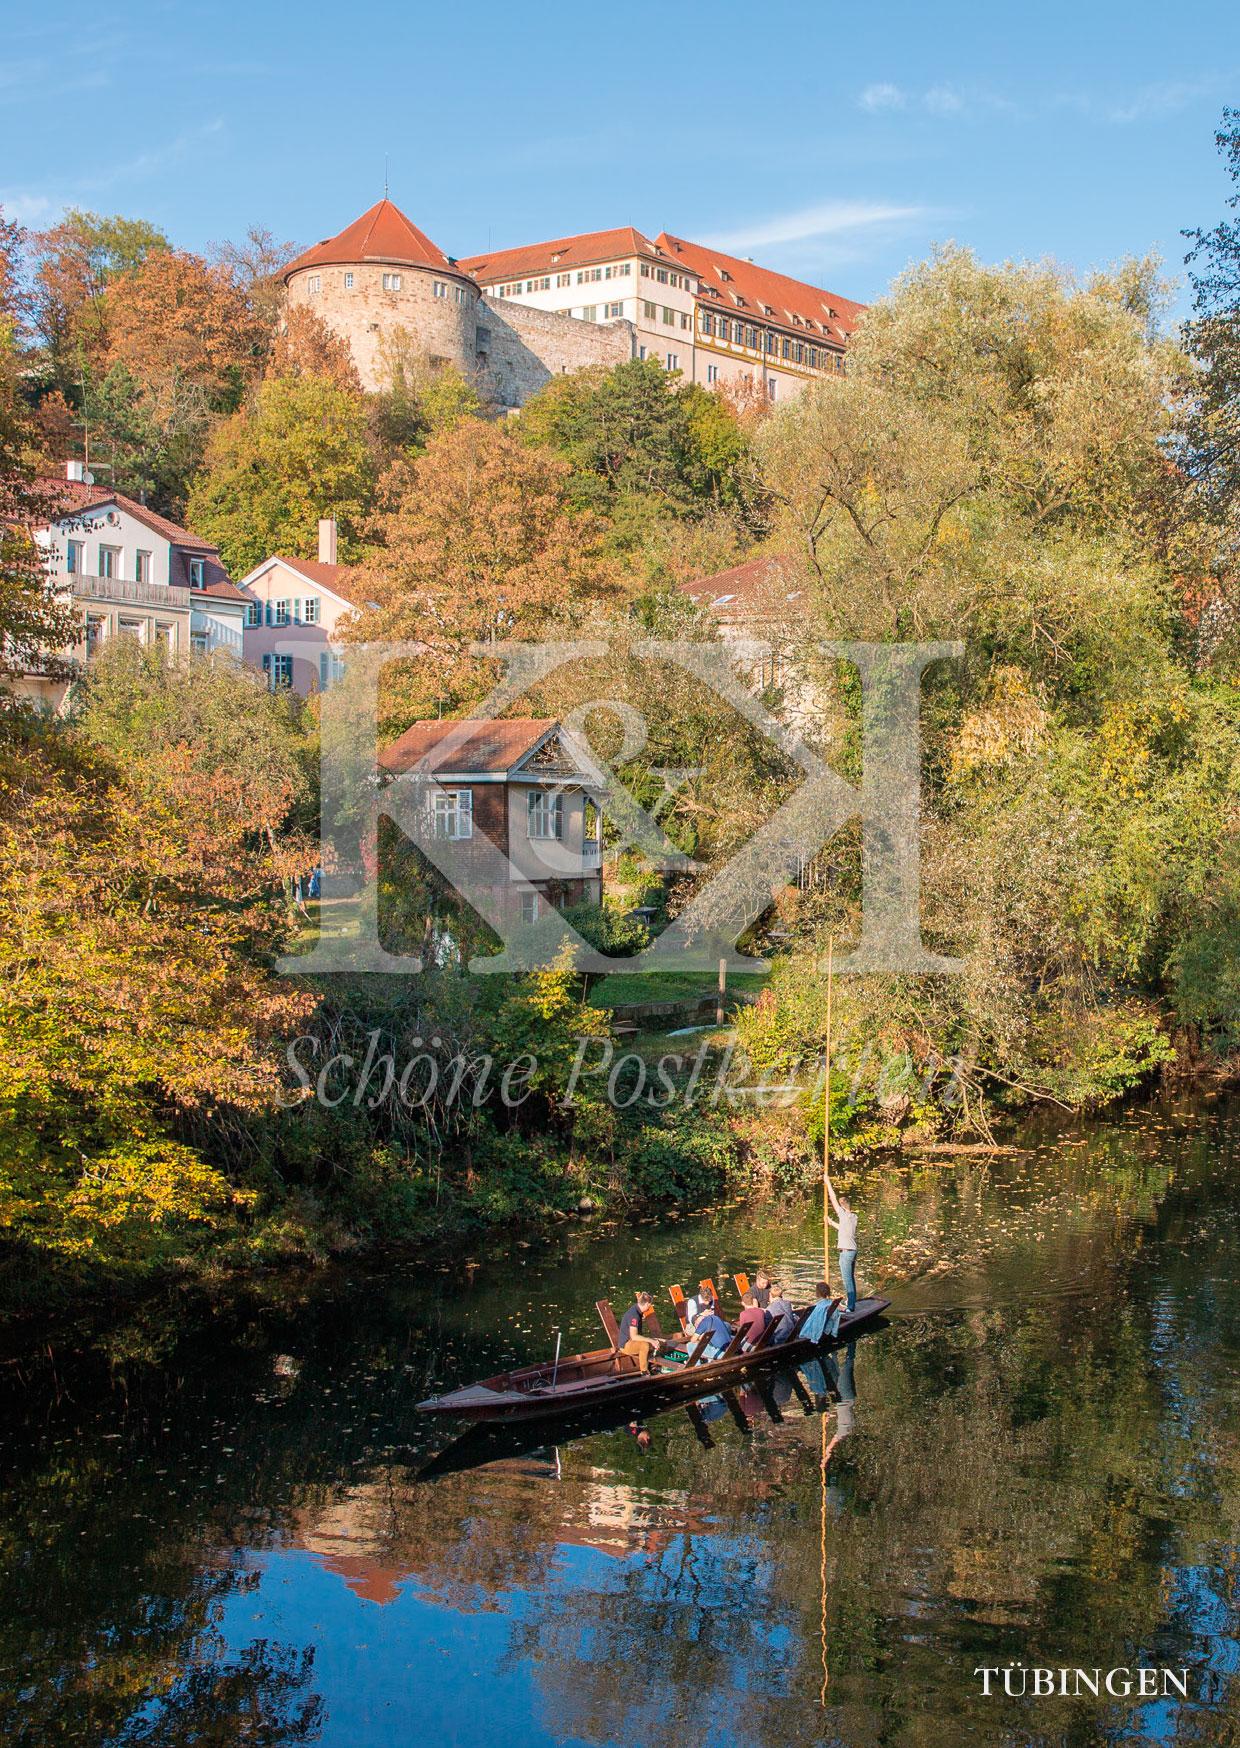 Schöne Postkarte Nr. 92 · Stocherkahn auf dem Neckar, Tübingen © 2018